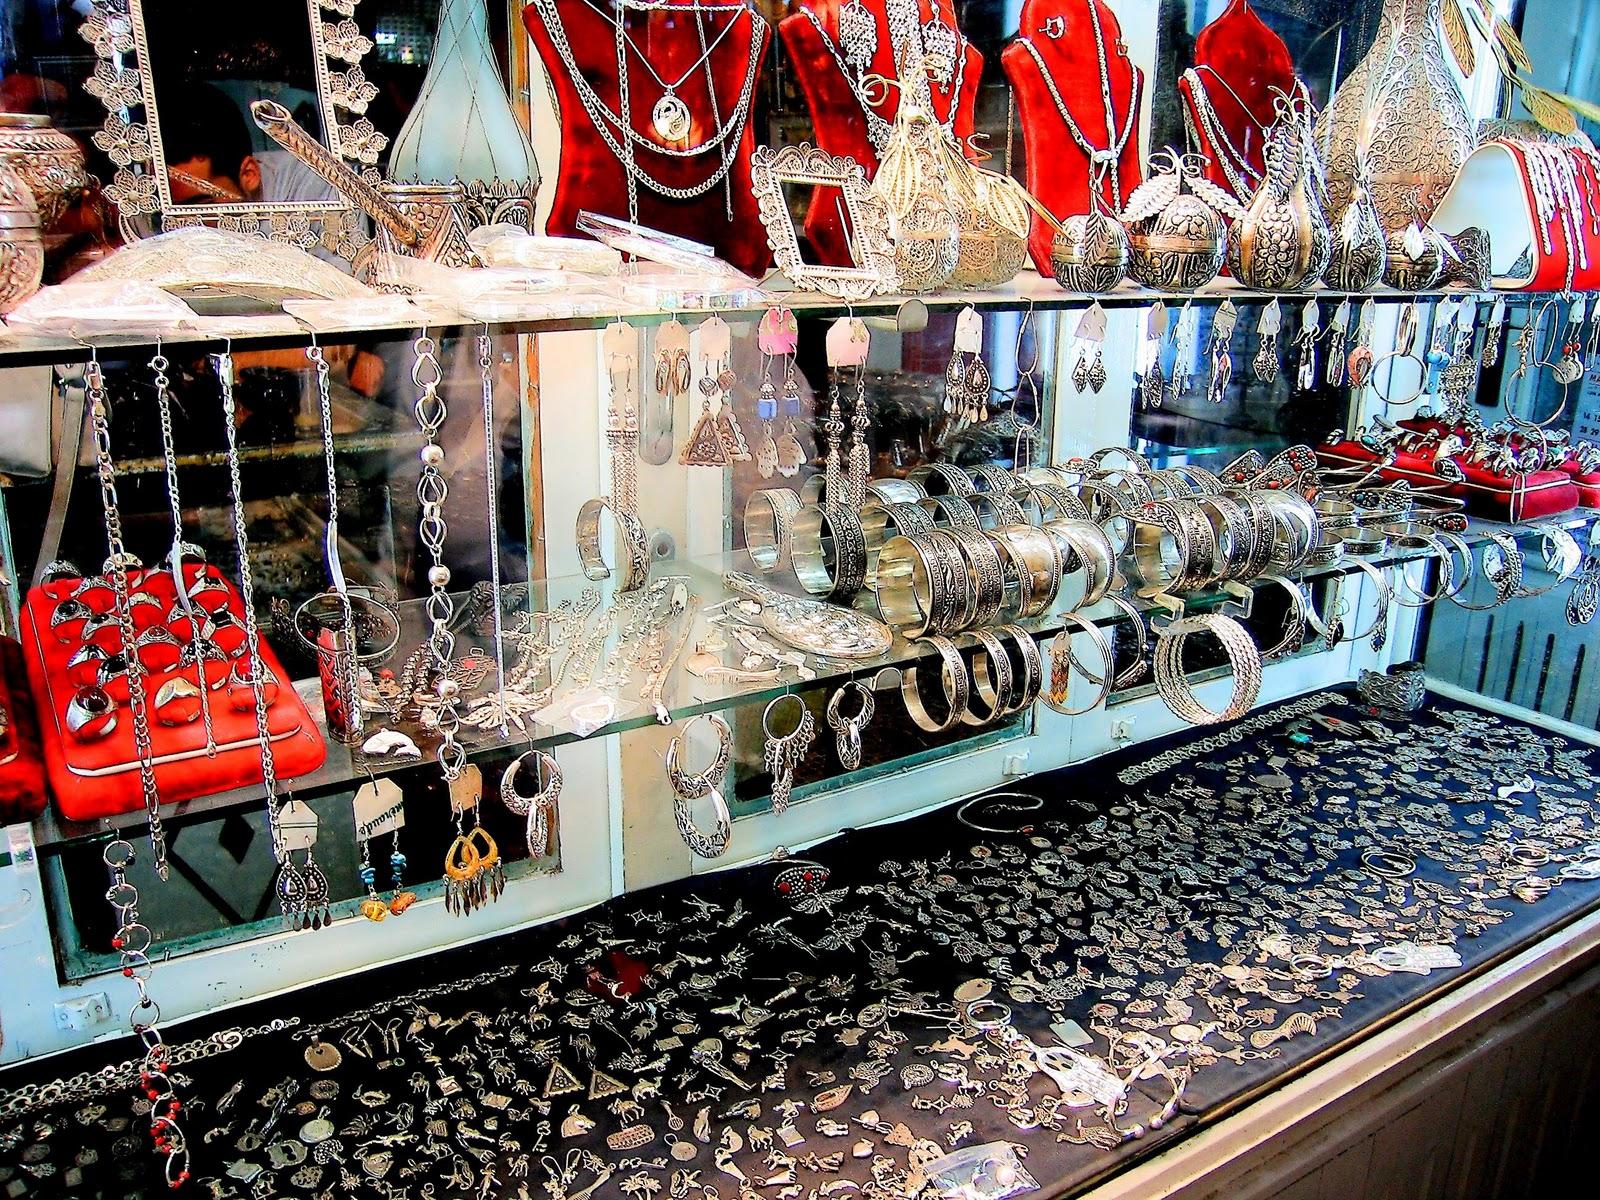 http://3.bp.blogspot.com/-Jn6KicDnAa0/TnjEhCkPcII/AAAAAAAANsc/tyHBHfQNnlM/s1600/Jewellery+Wallpapers+%25288%2529.jpg